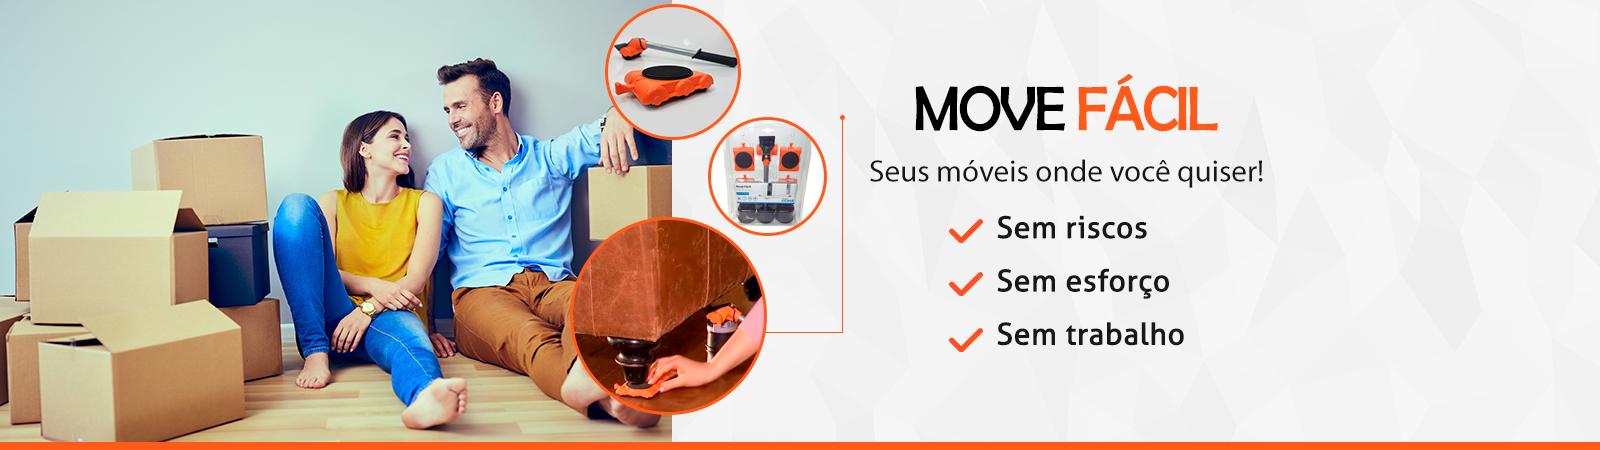 Move Fácil